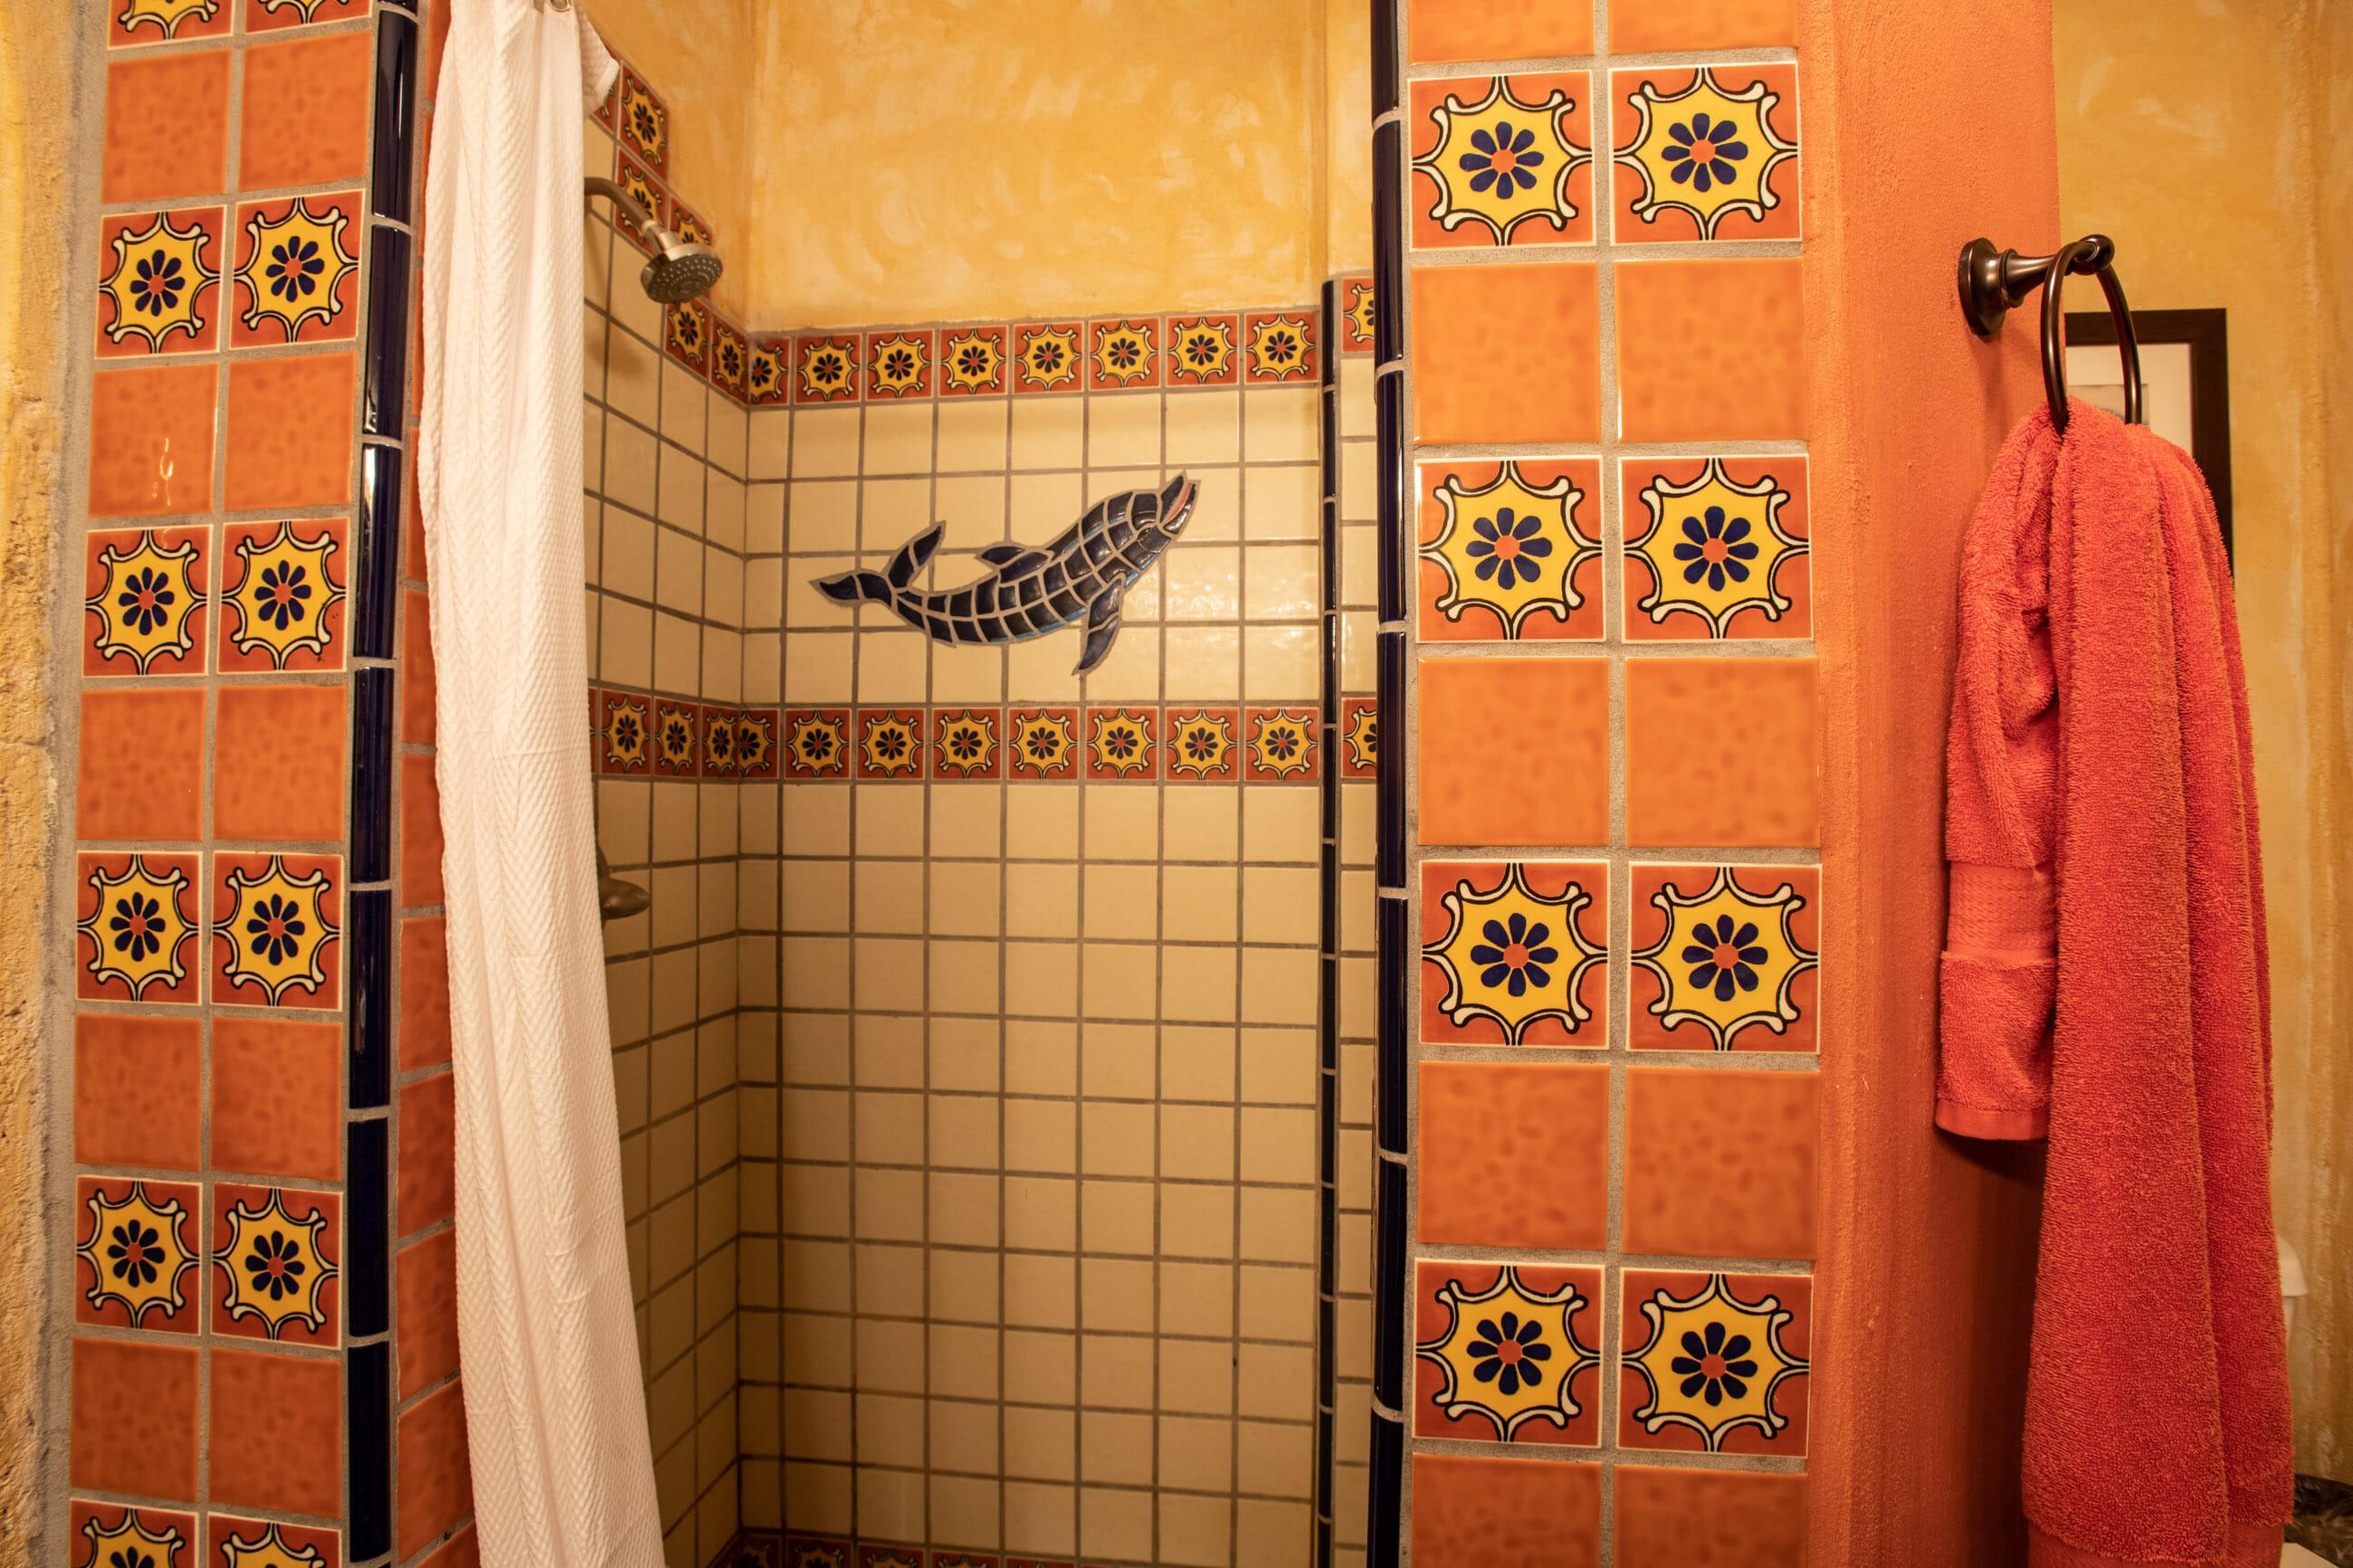 288 Davis St Loreto, Baja California Sur Mexico: Talavera tiled master shower